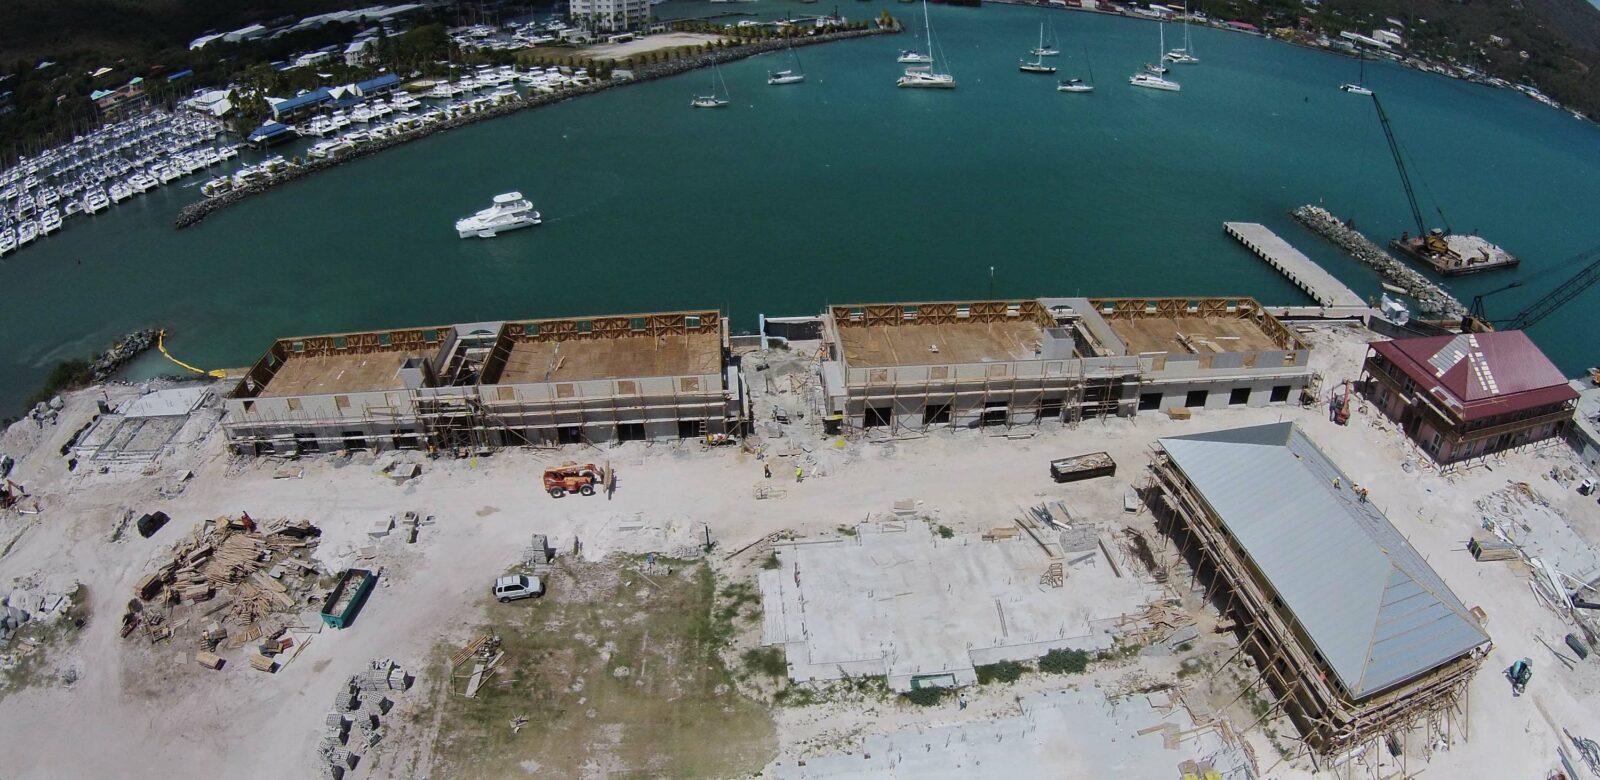 British Virgin Islands (BVI) Cruise Ship Pier Expansion